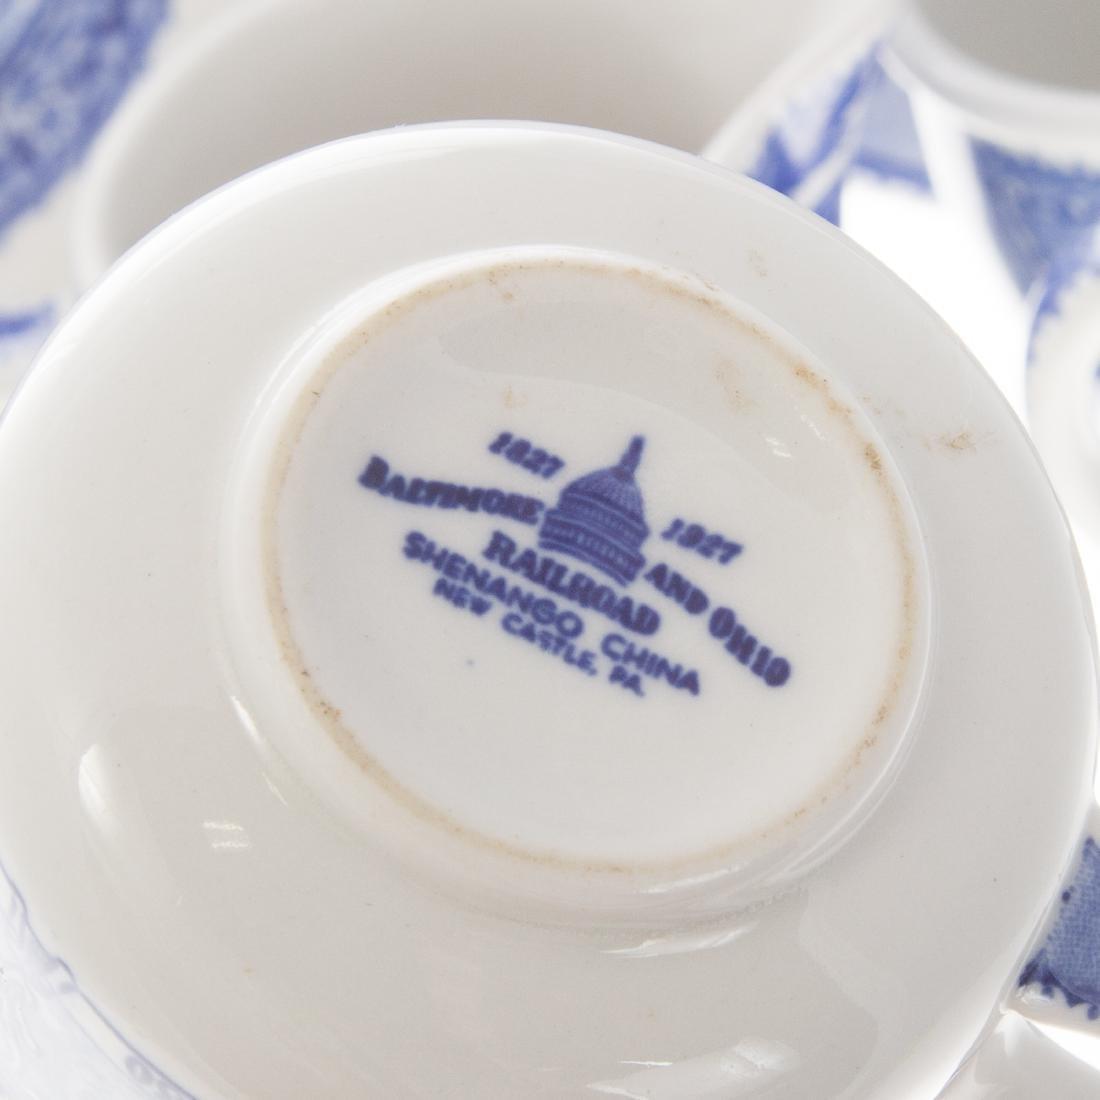 13 Shenango B & O china articles - 2